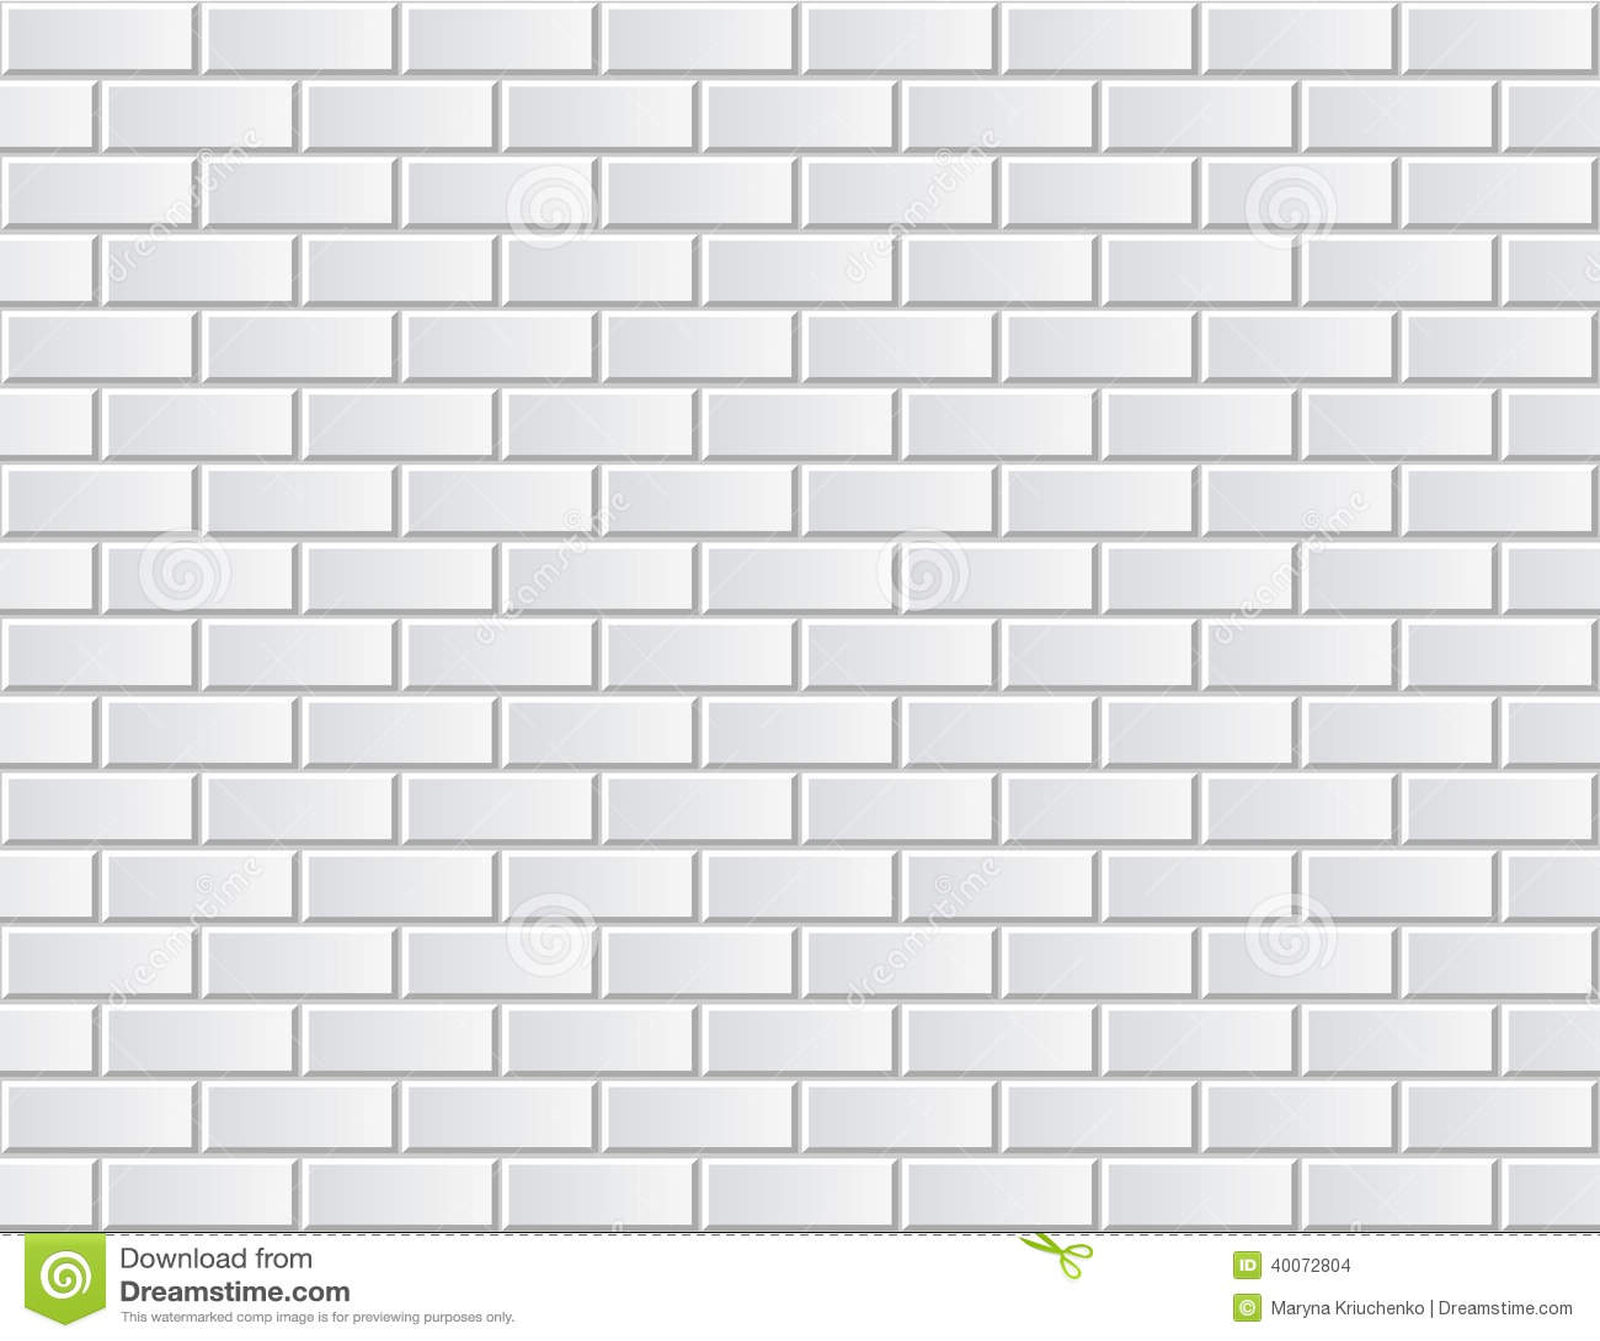 Seamless vector white brick wall - background pattern